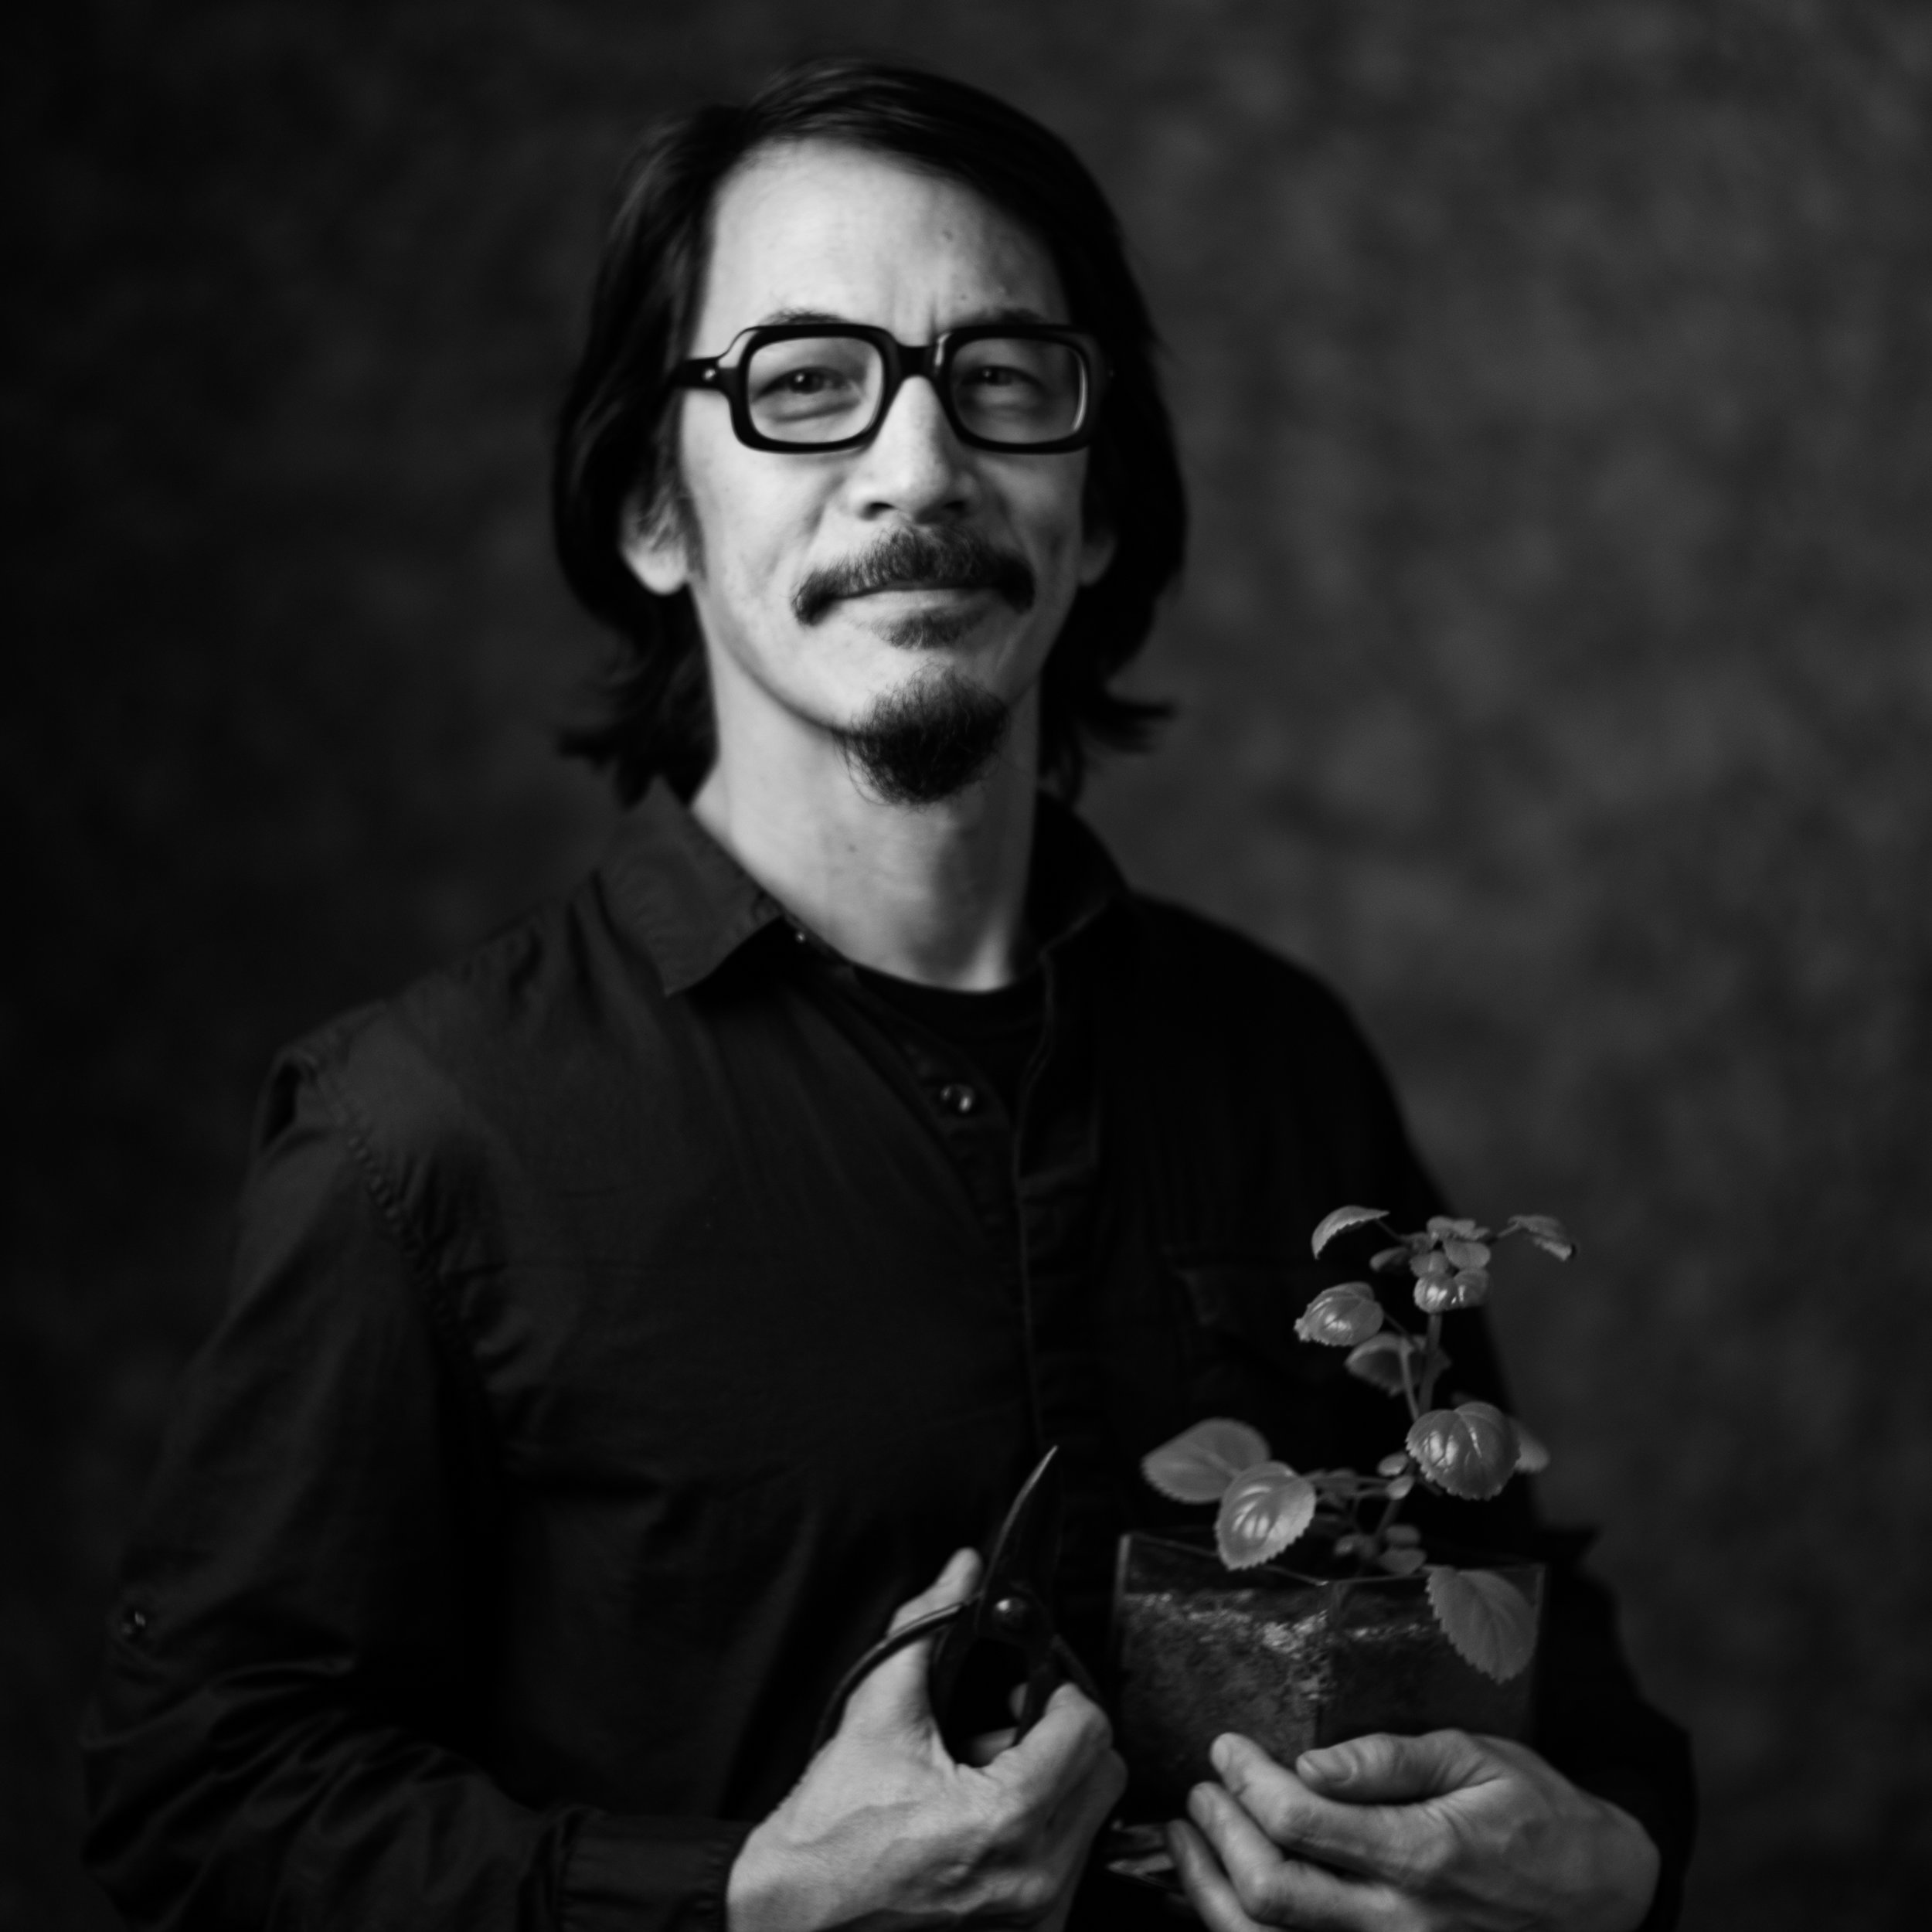 MARK DECENA | Founder